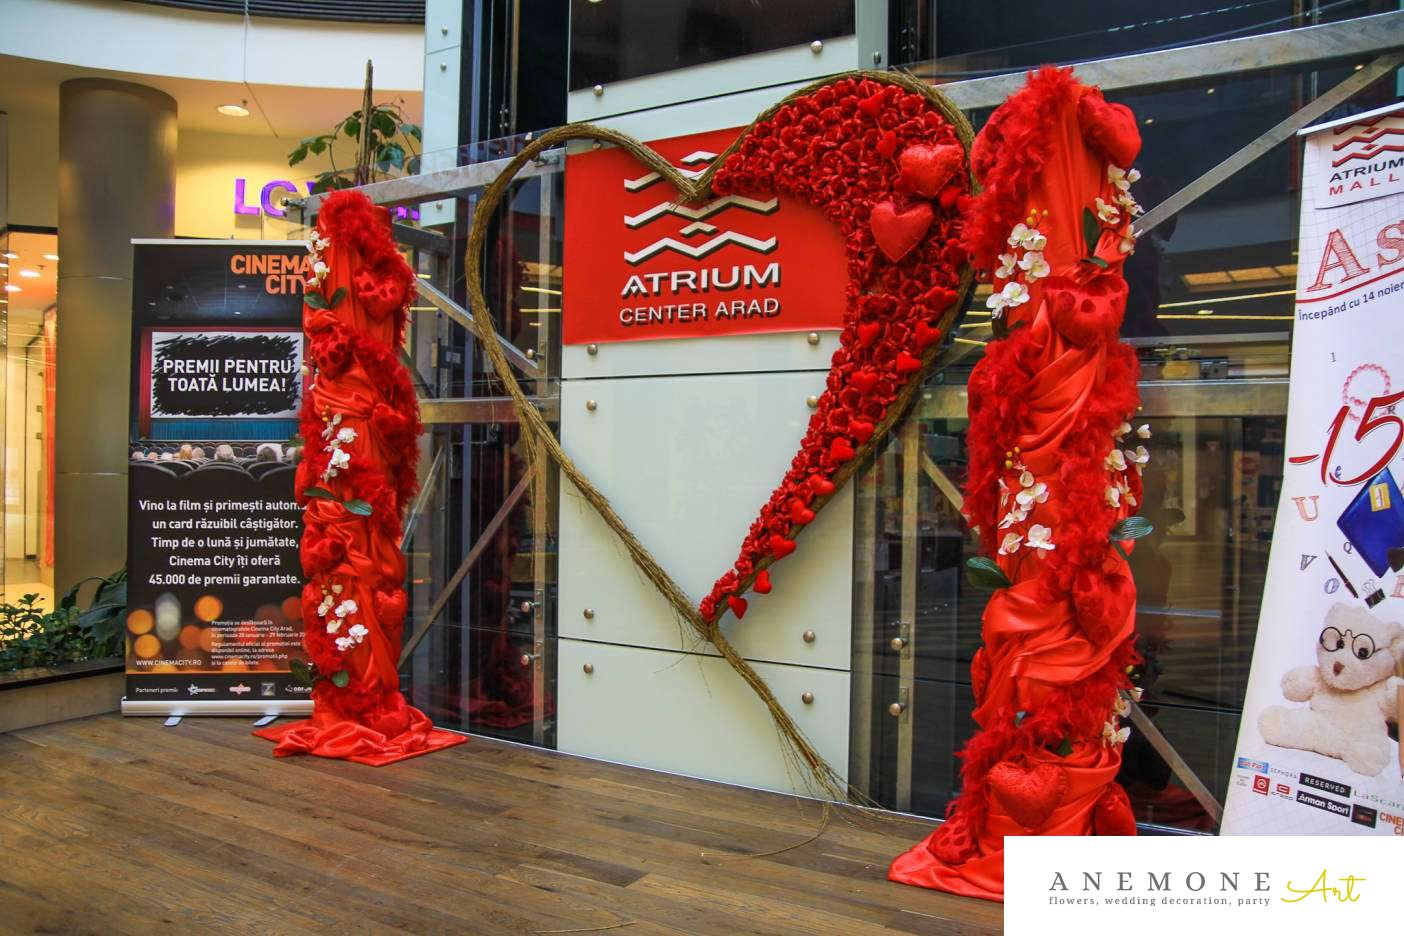 Poza, foto cu Flori de nunta atrium mall, decor tematic, inima, orhidee in Arad, Timisoara, Oradea (wedding flowers, bouquets) nunta Arad, Timisoara, Oradea